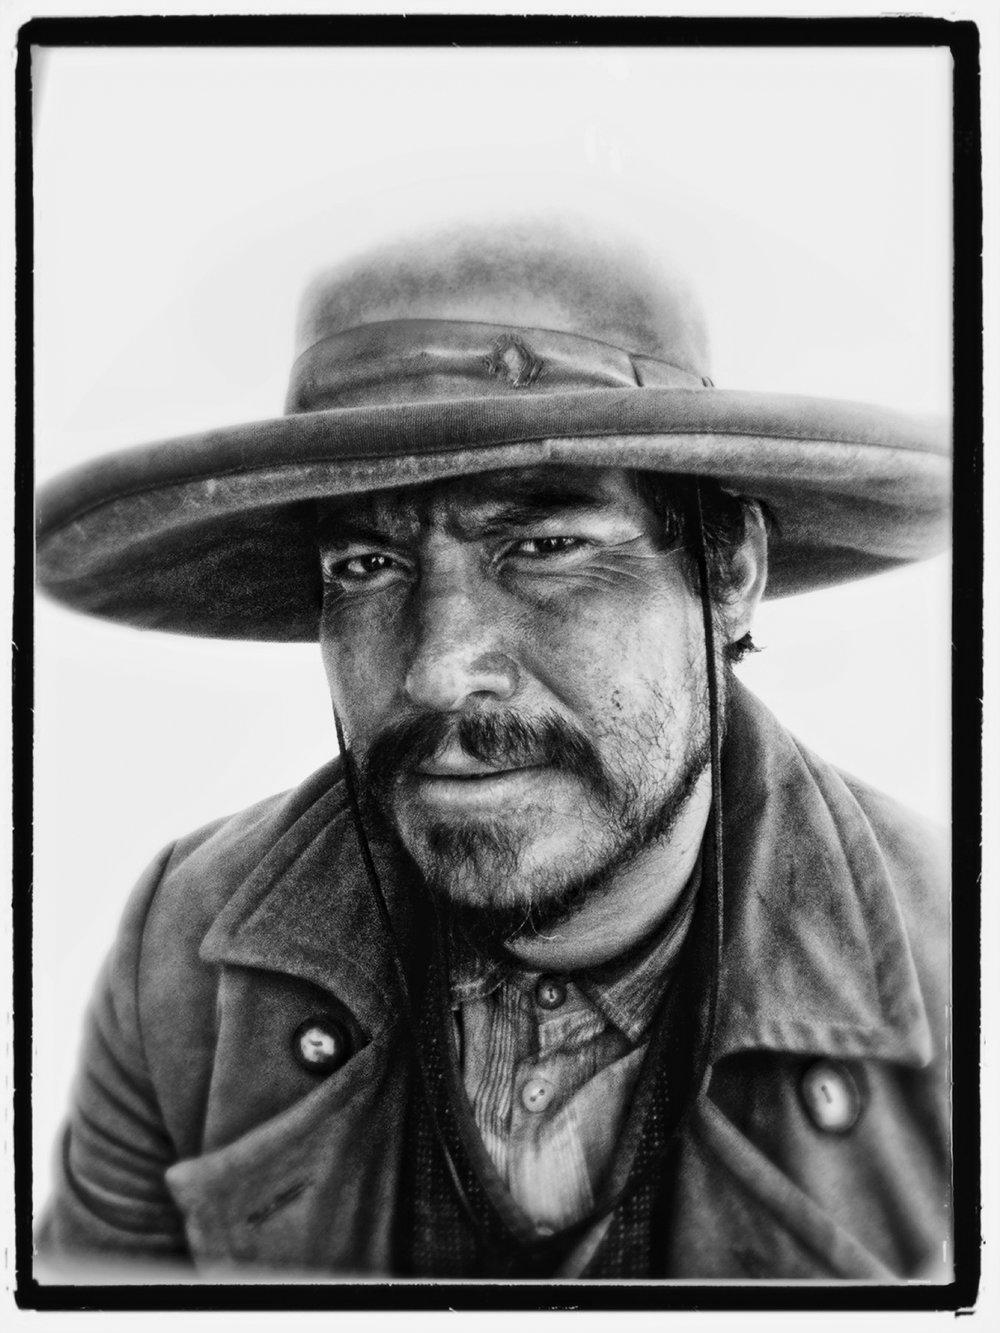 C&A_Julio Cedillo B&W Portrait 24x32.jpg